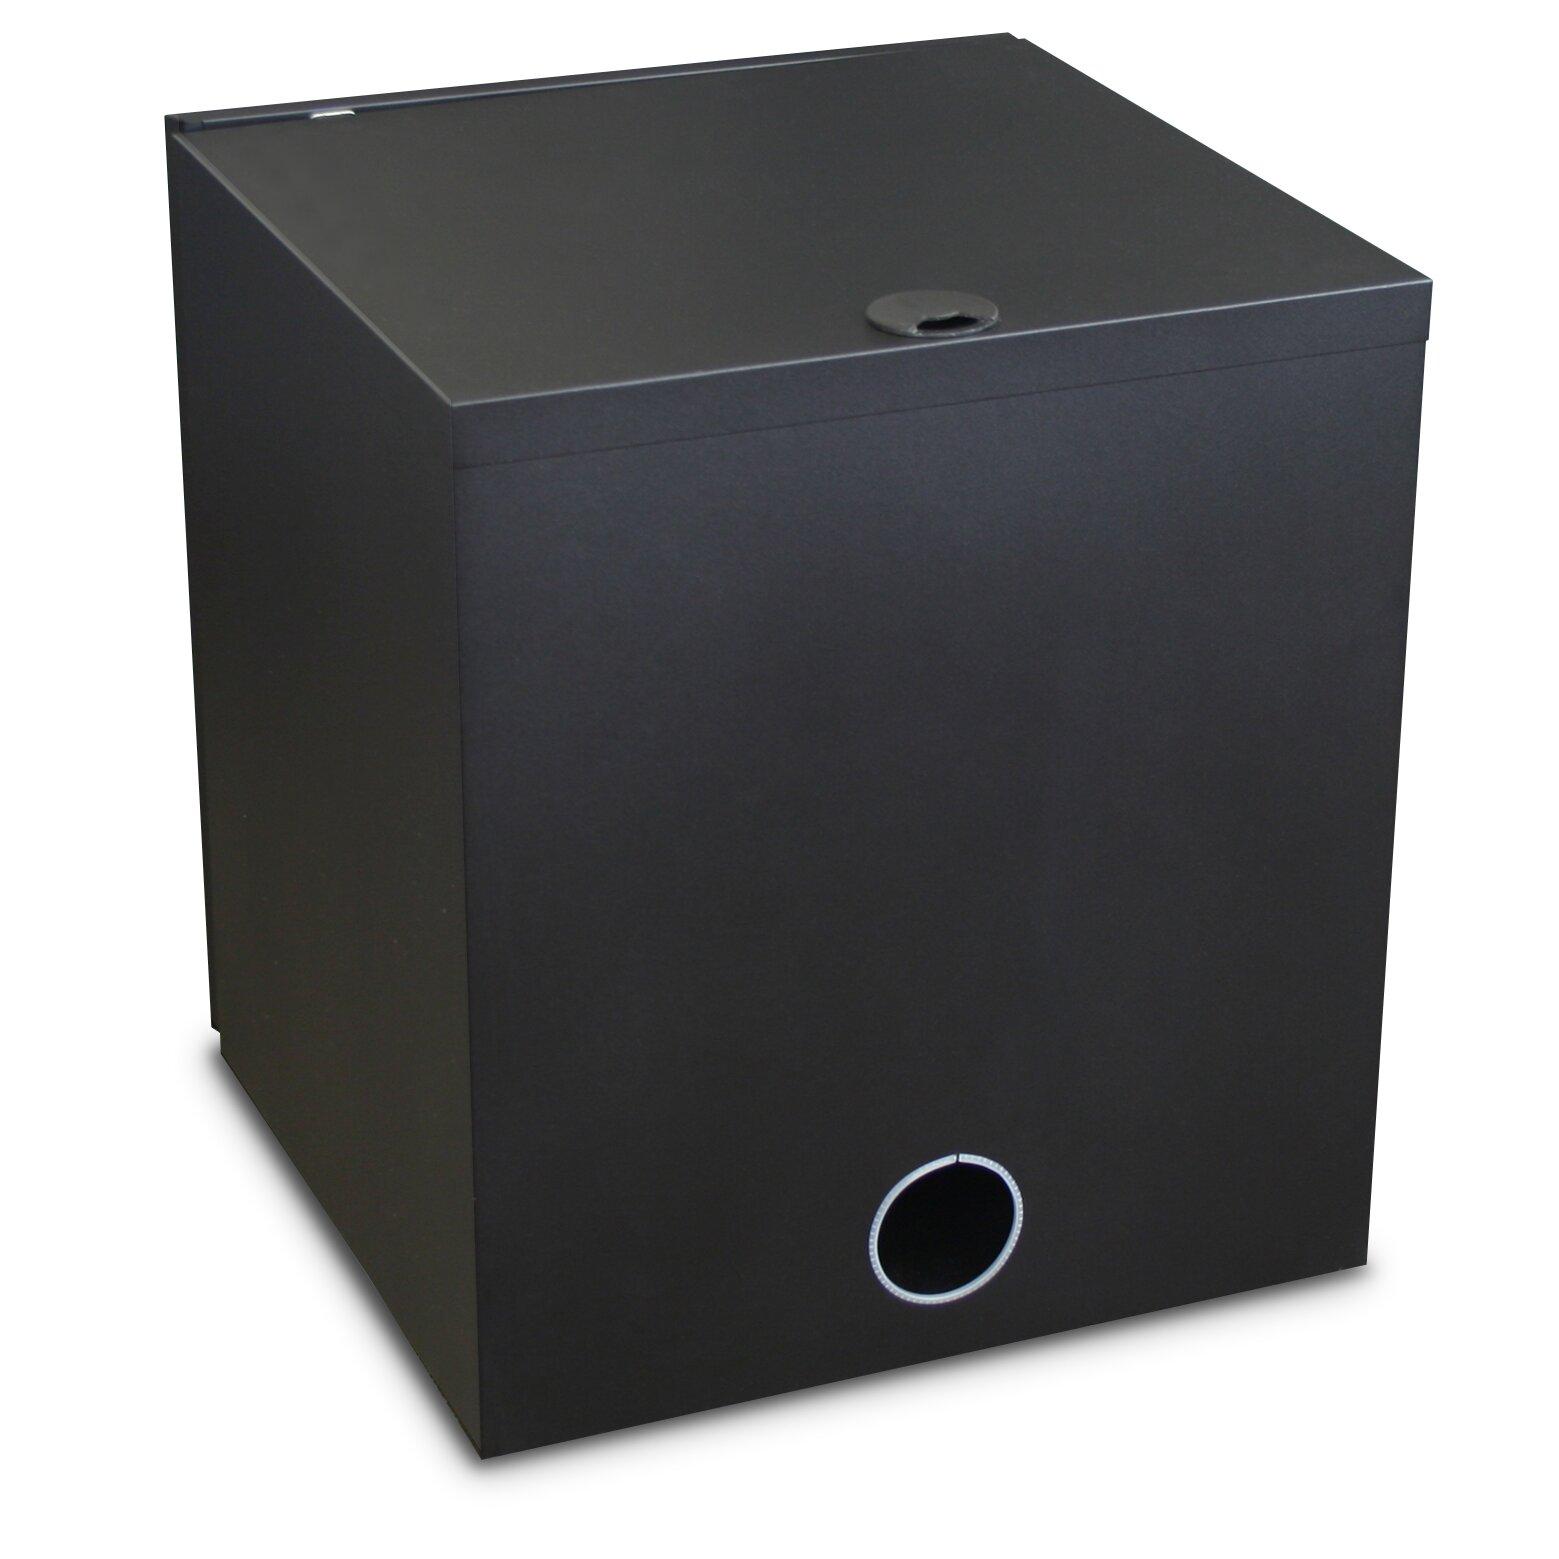 Wayfair supply storage amp organization all filing cabinets marvel